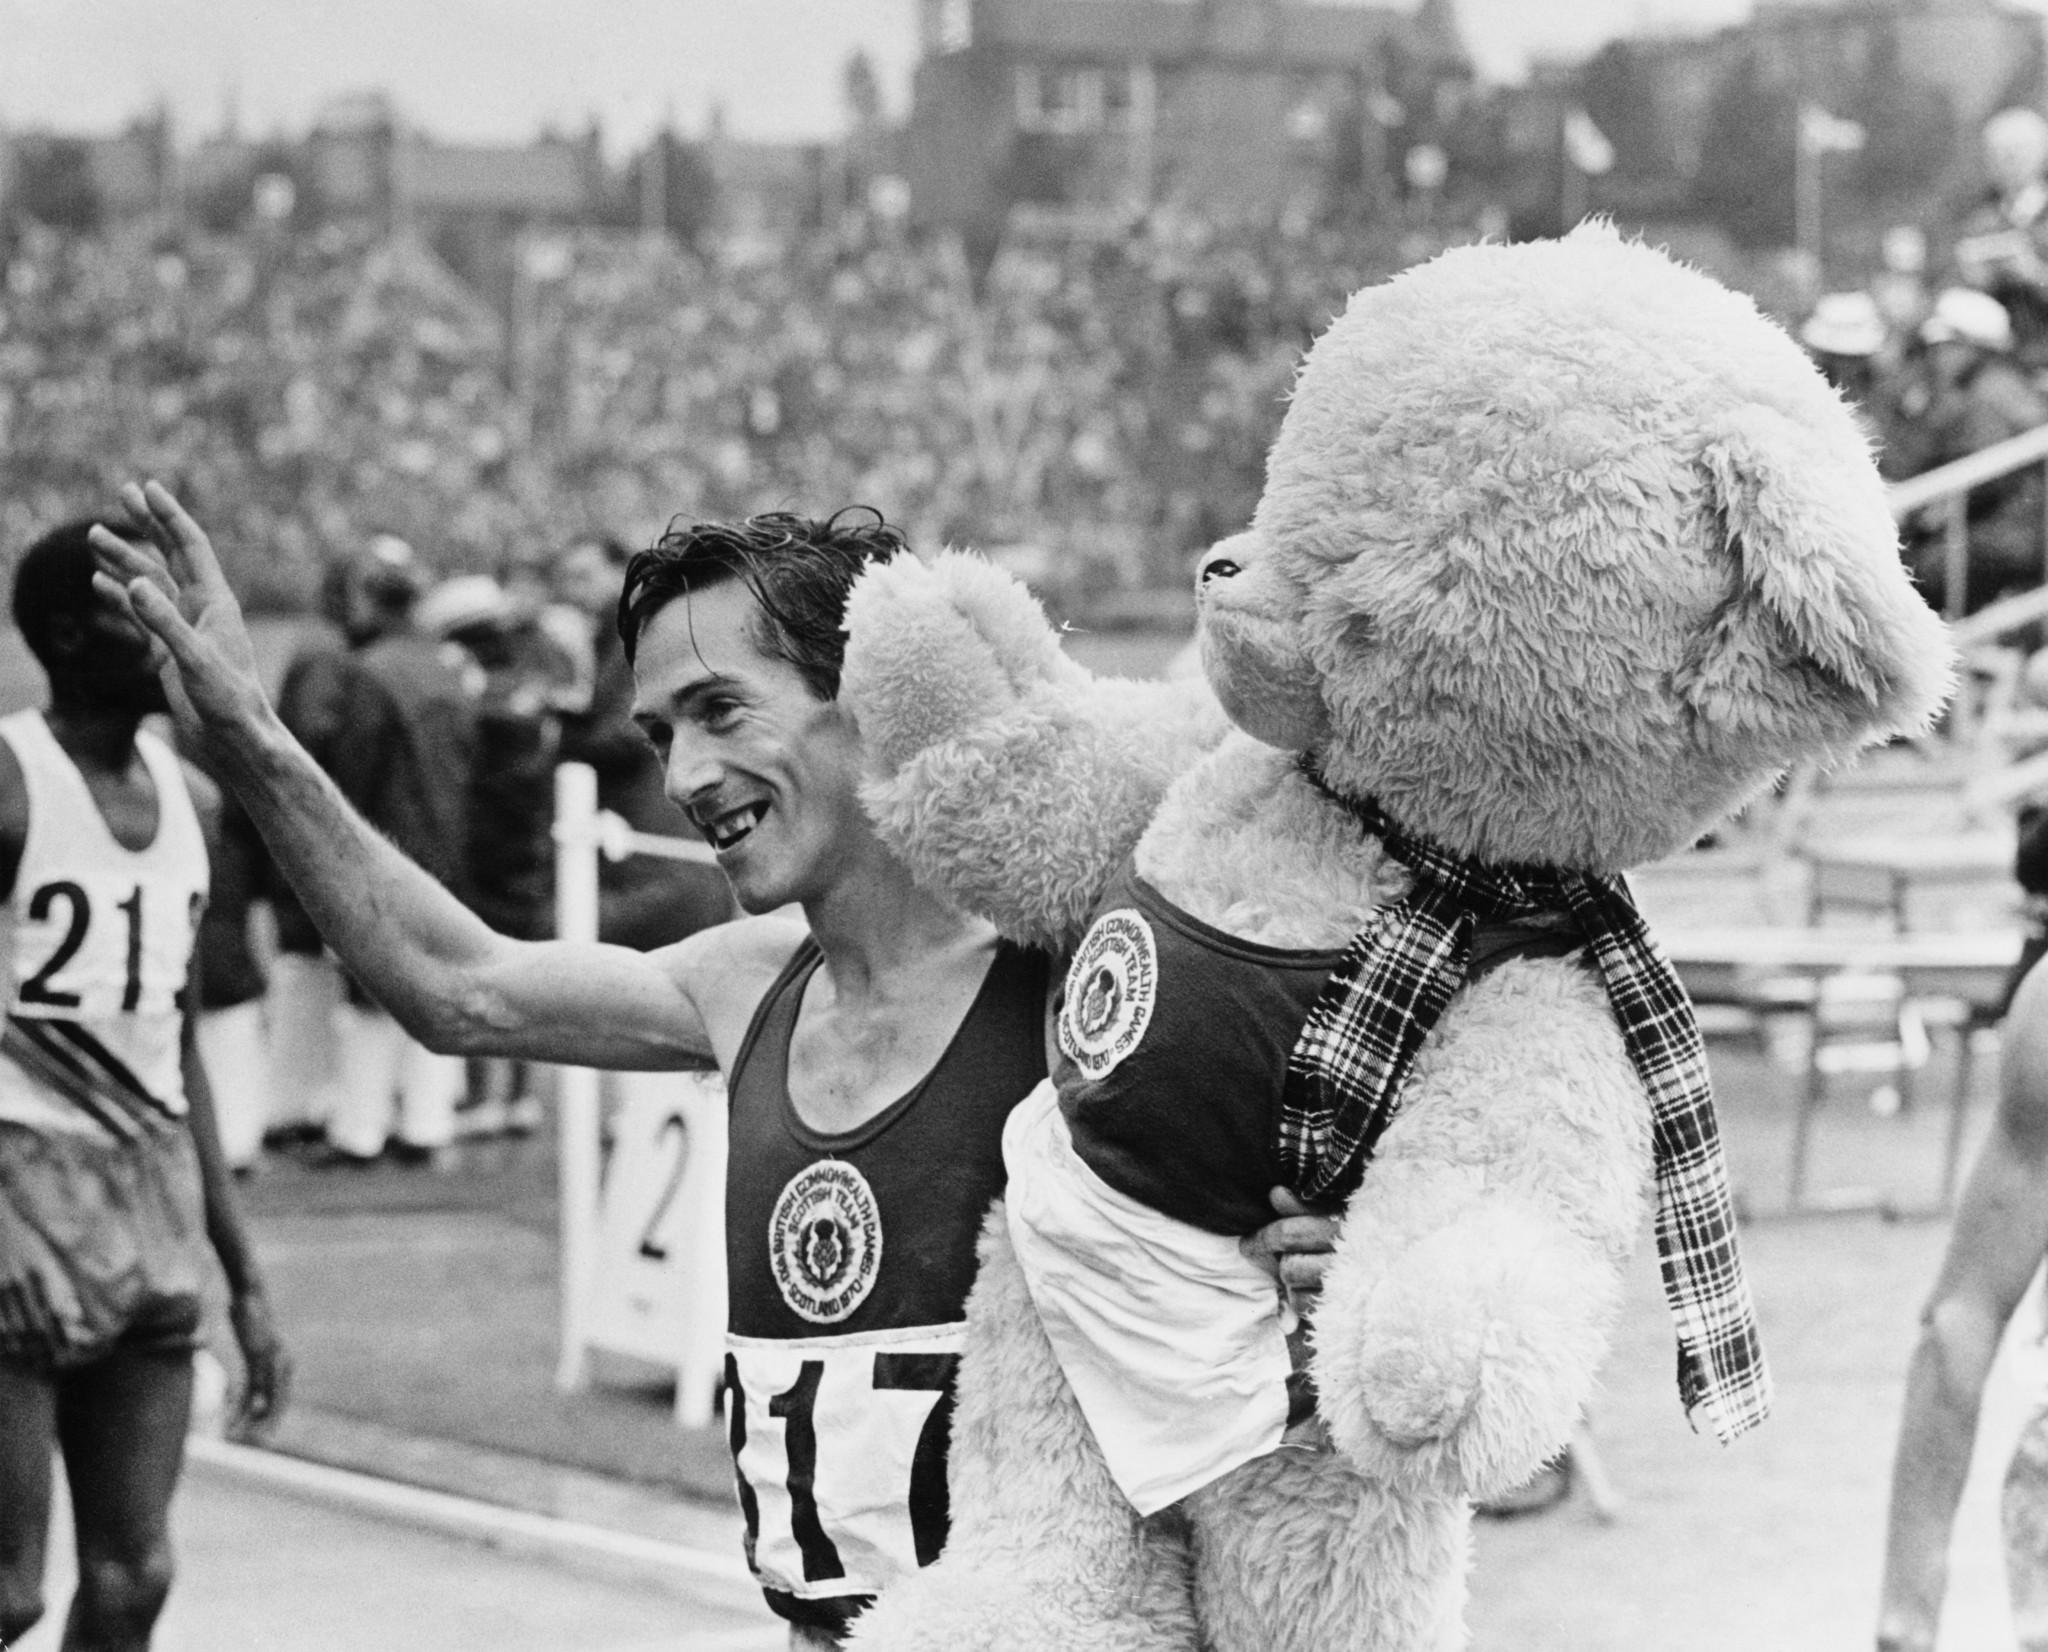 Commonwealth Games Scotland celebrates 50 years since Edinburgh 1970